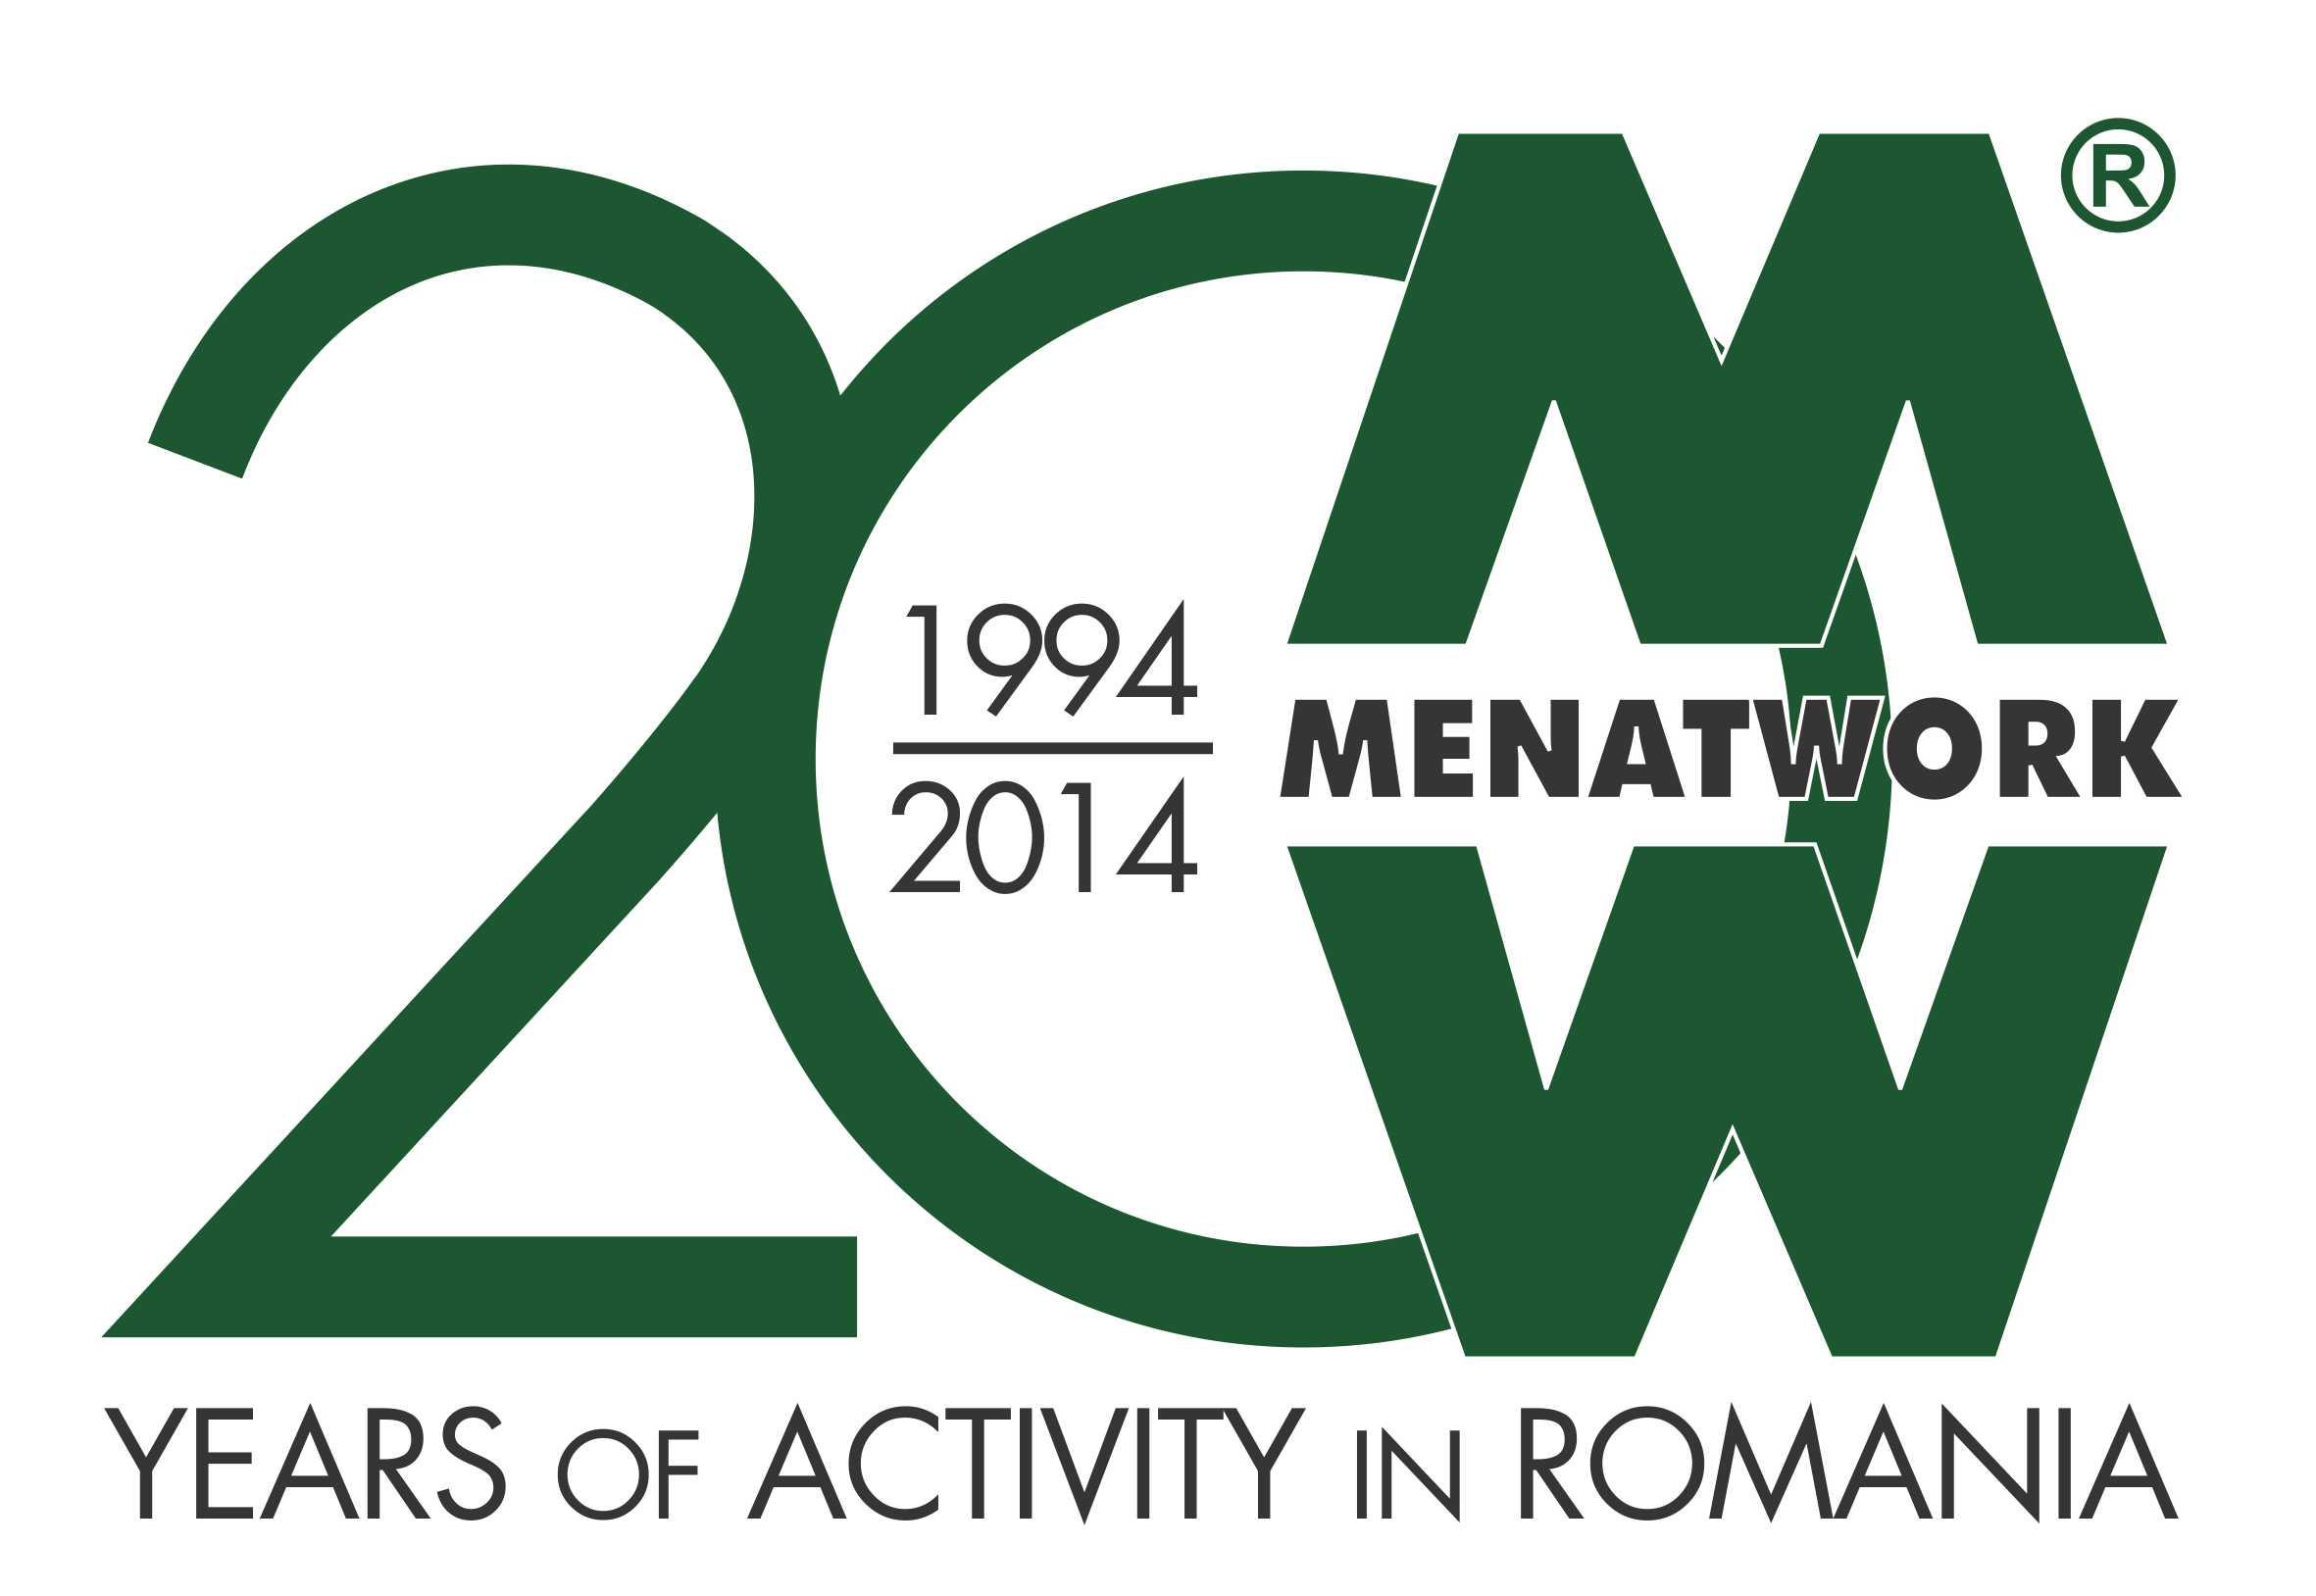 Grupul de firme Menatwork - Grupul de firme Menatwork